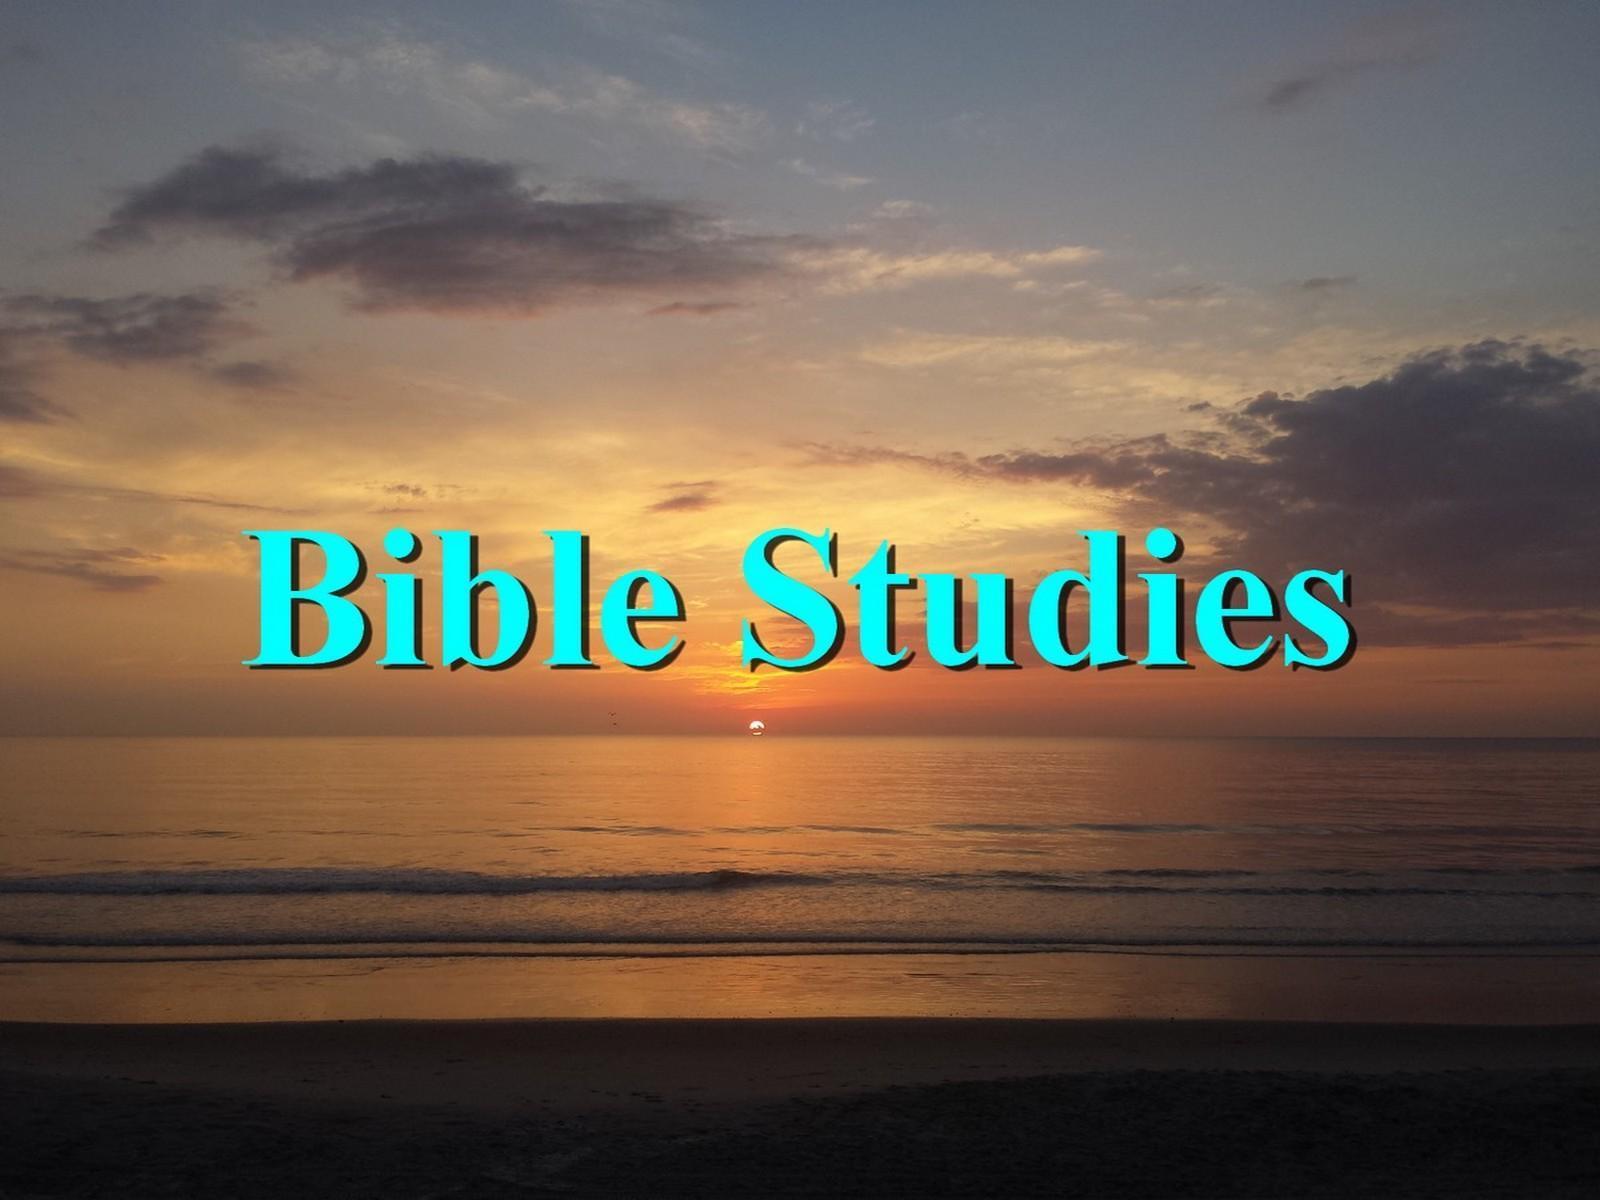 Attorney in Christ │ 321 779 1211 │ Spiritual Help